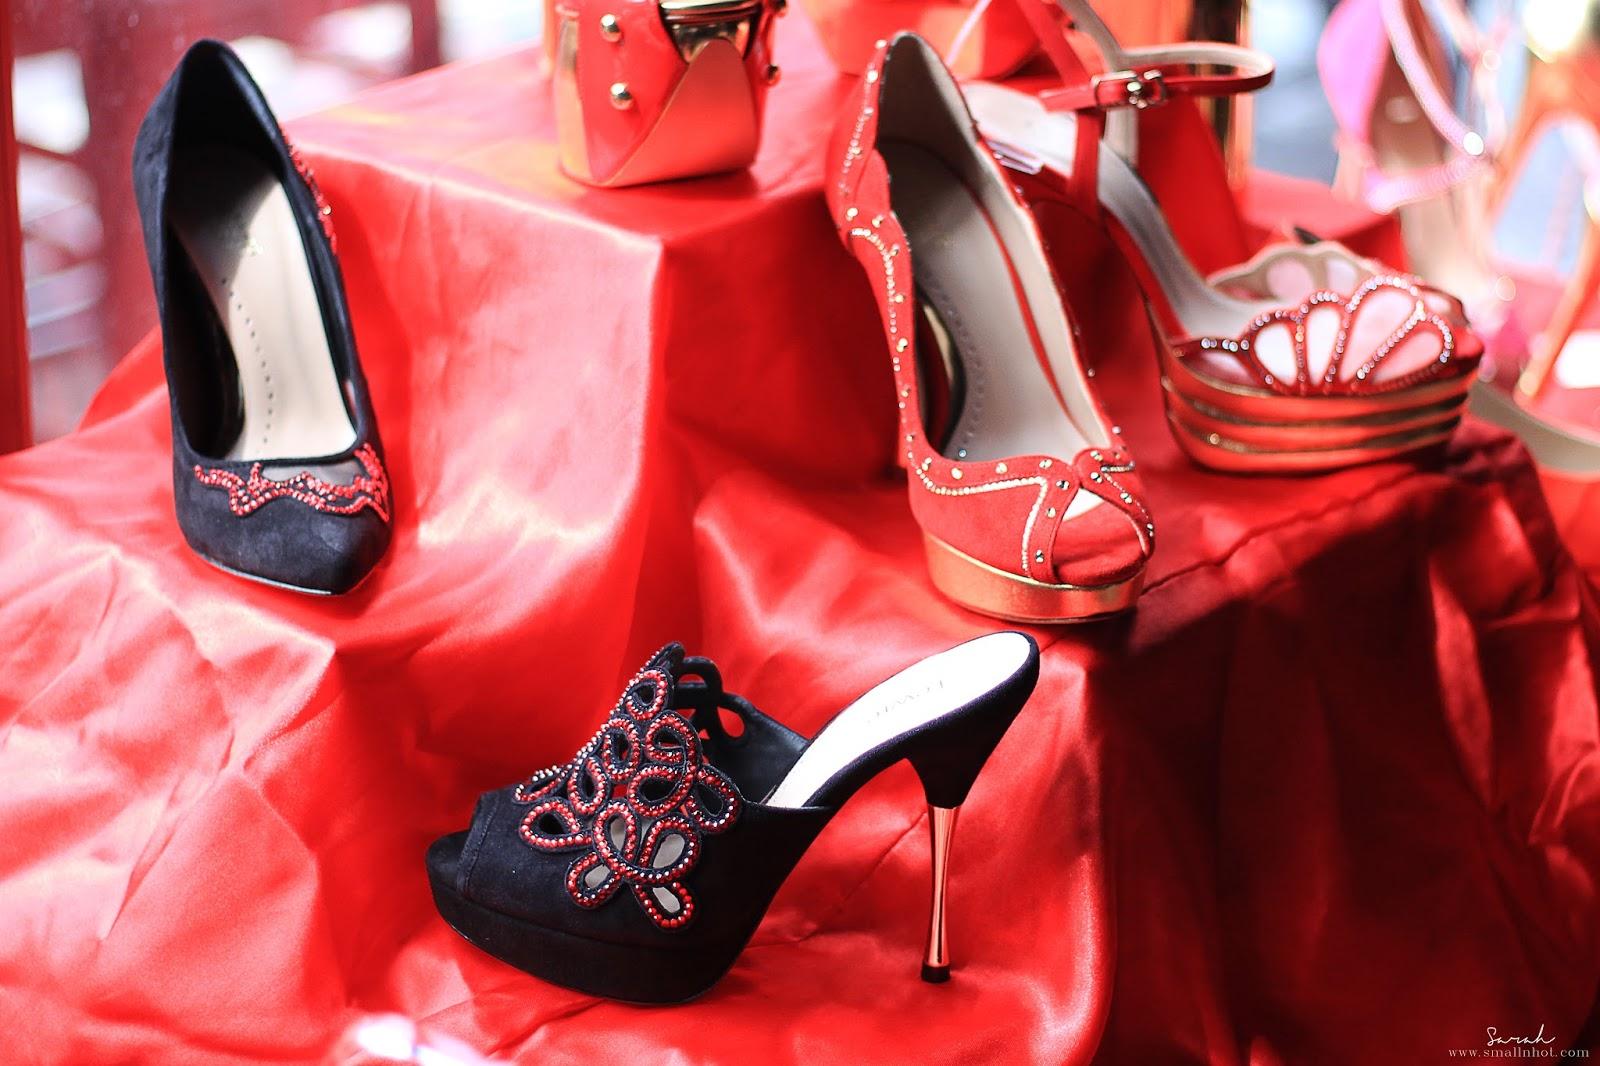 Lewré Bespoke Grandeur Red CNY 2017 Collection forbidden city; Lewré Bespoke Grandeur Red CNY 2017 Collection high heels; Lewré Bespoke Grandeur Red CNY 2017 Collection bespoke heels; Lewré Bespoke Grandeur Red CNY 2017 Collection handmade couture heels;